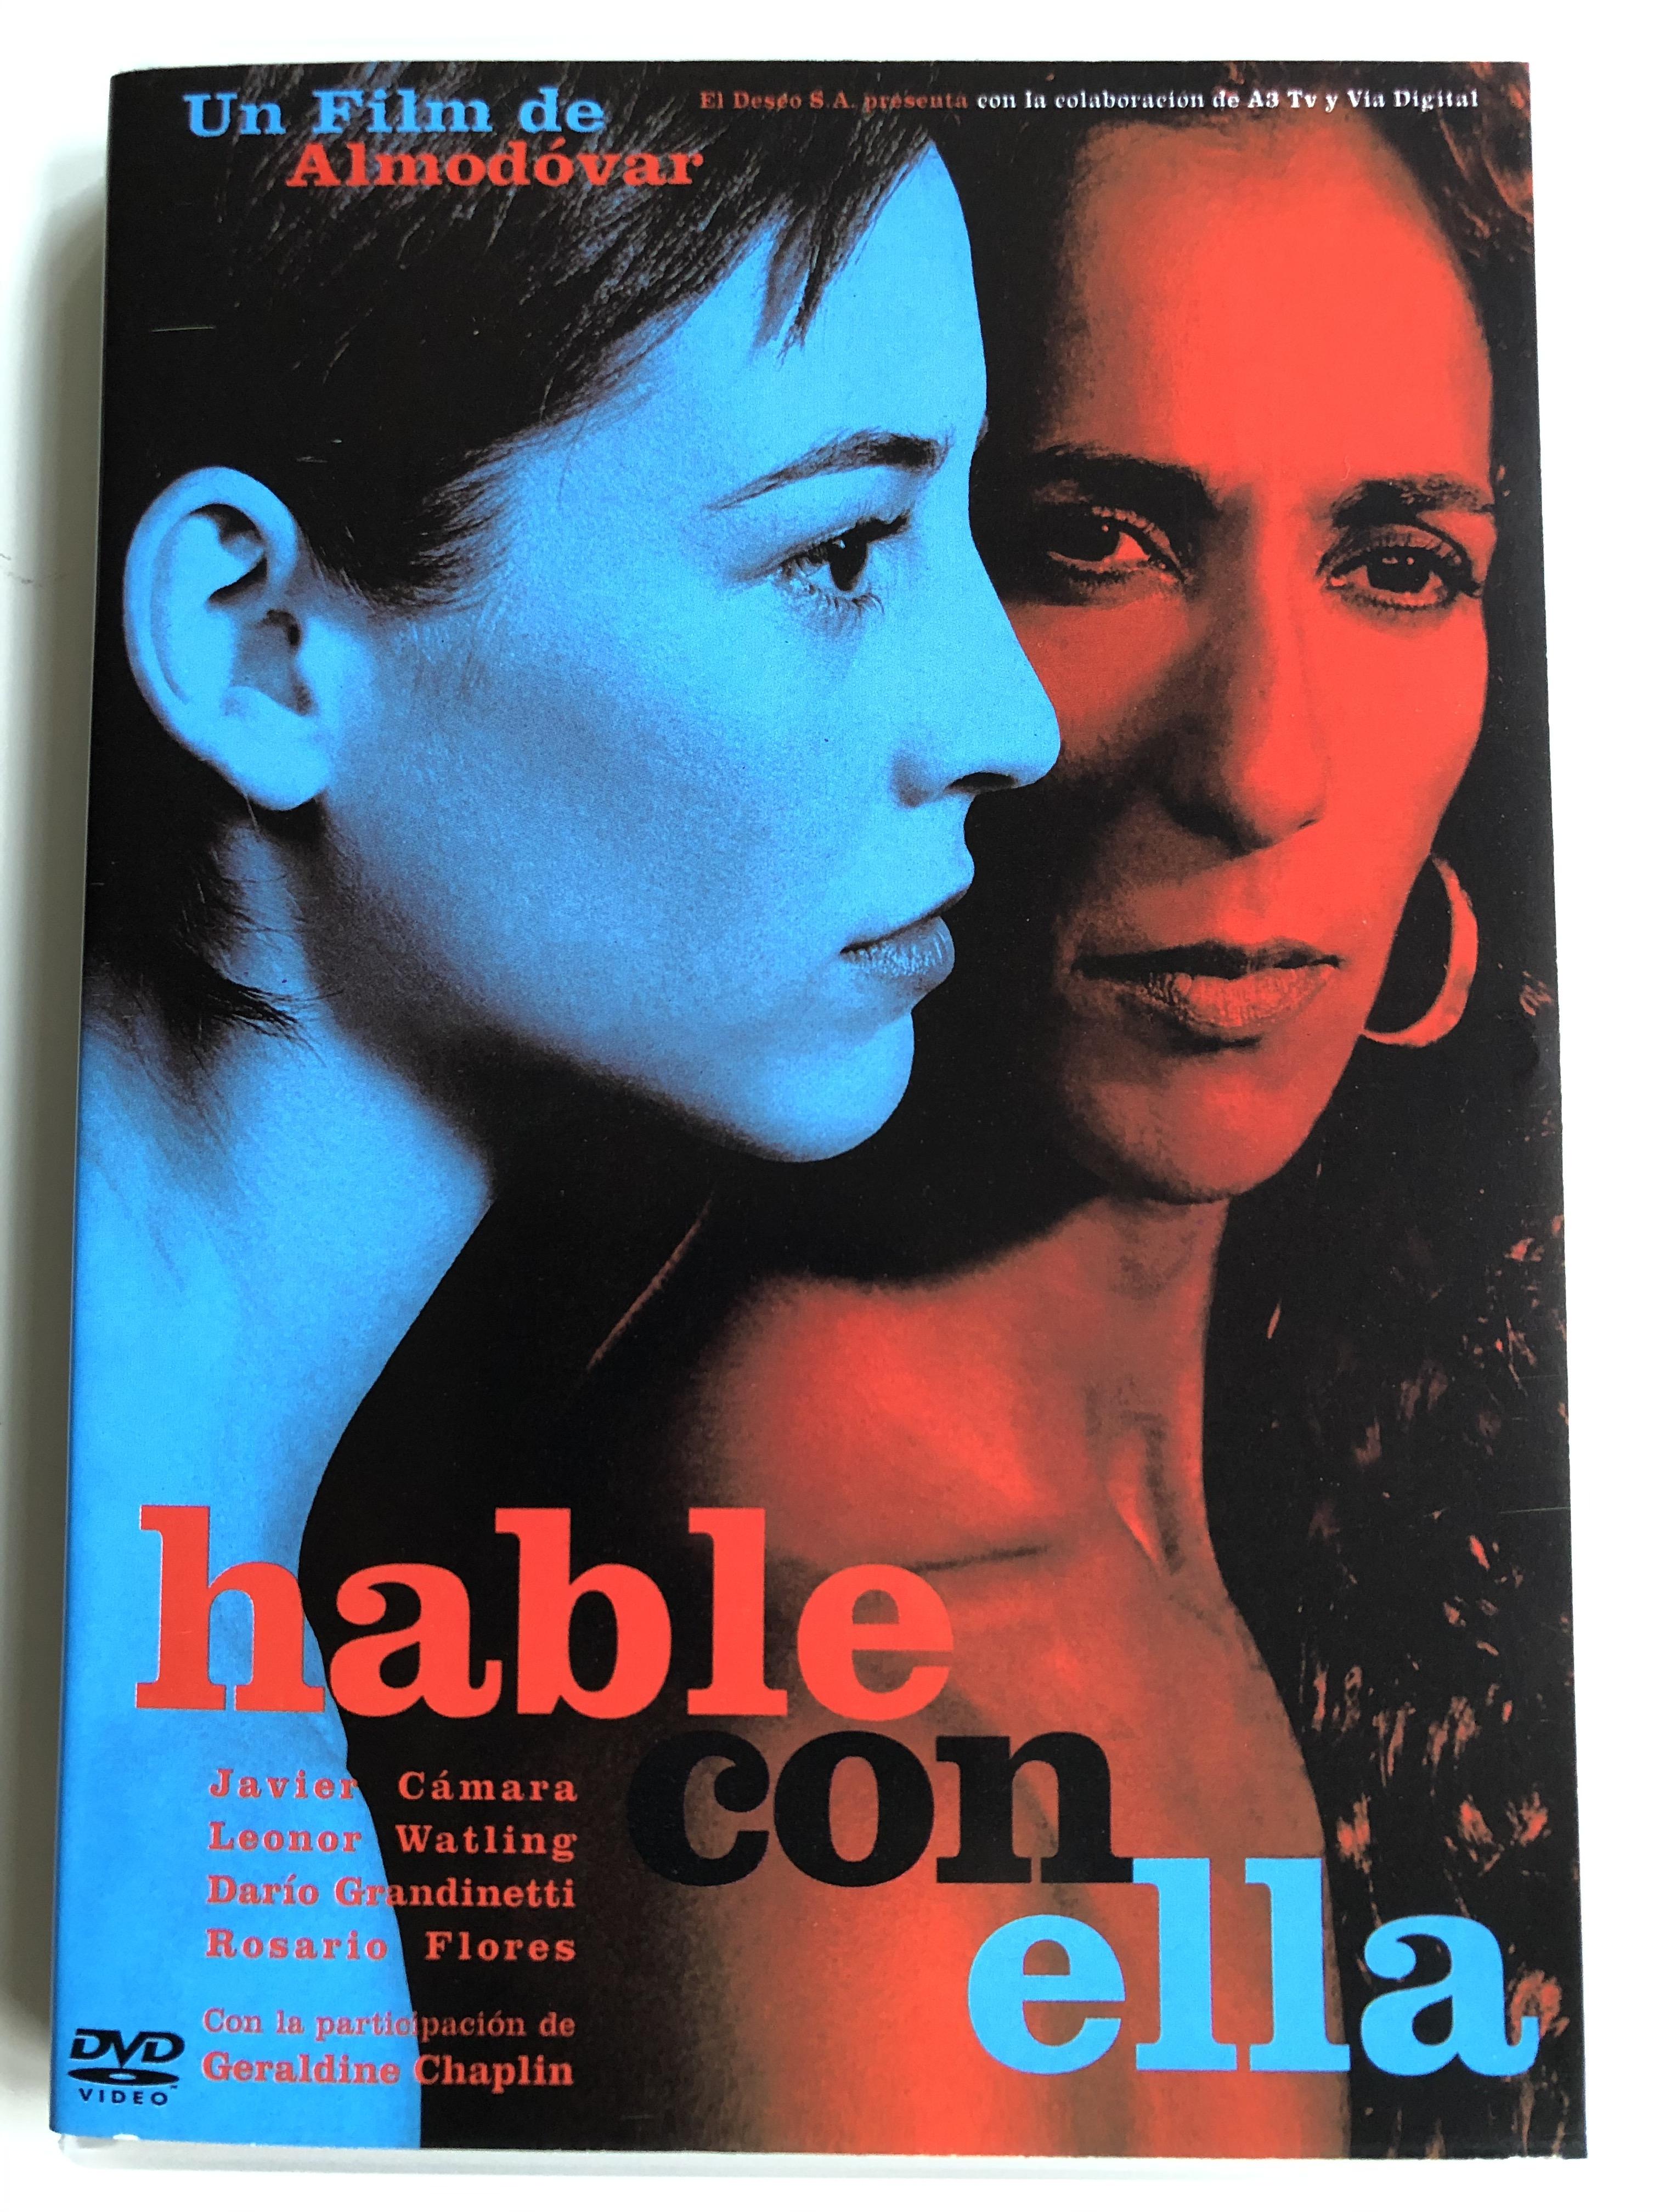 hable-con-ella-dvd-2002-talk-to-her-1.jpg